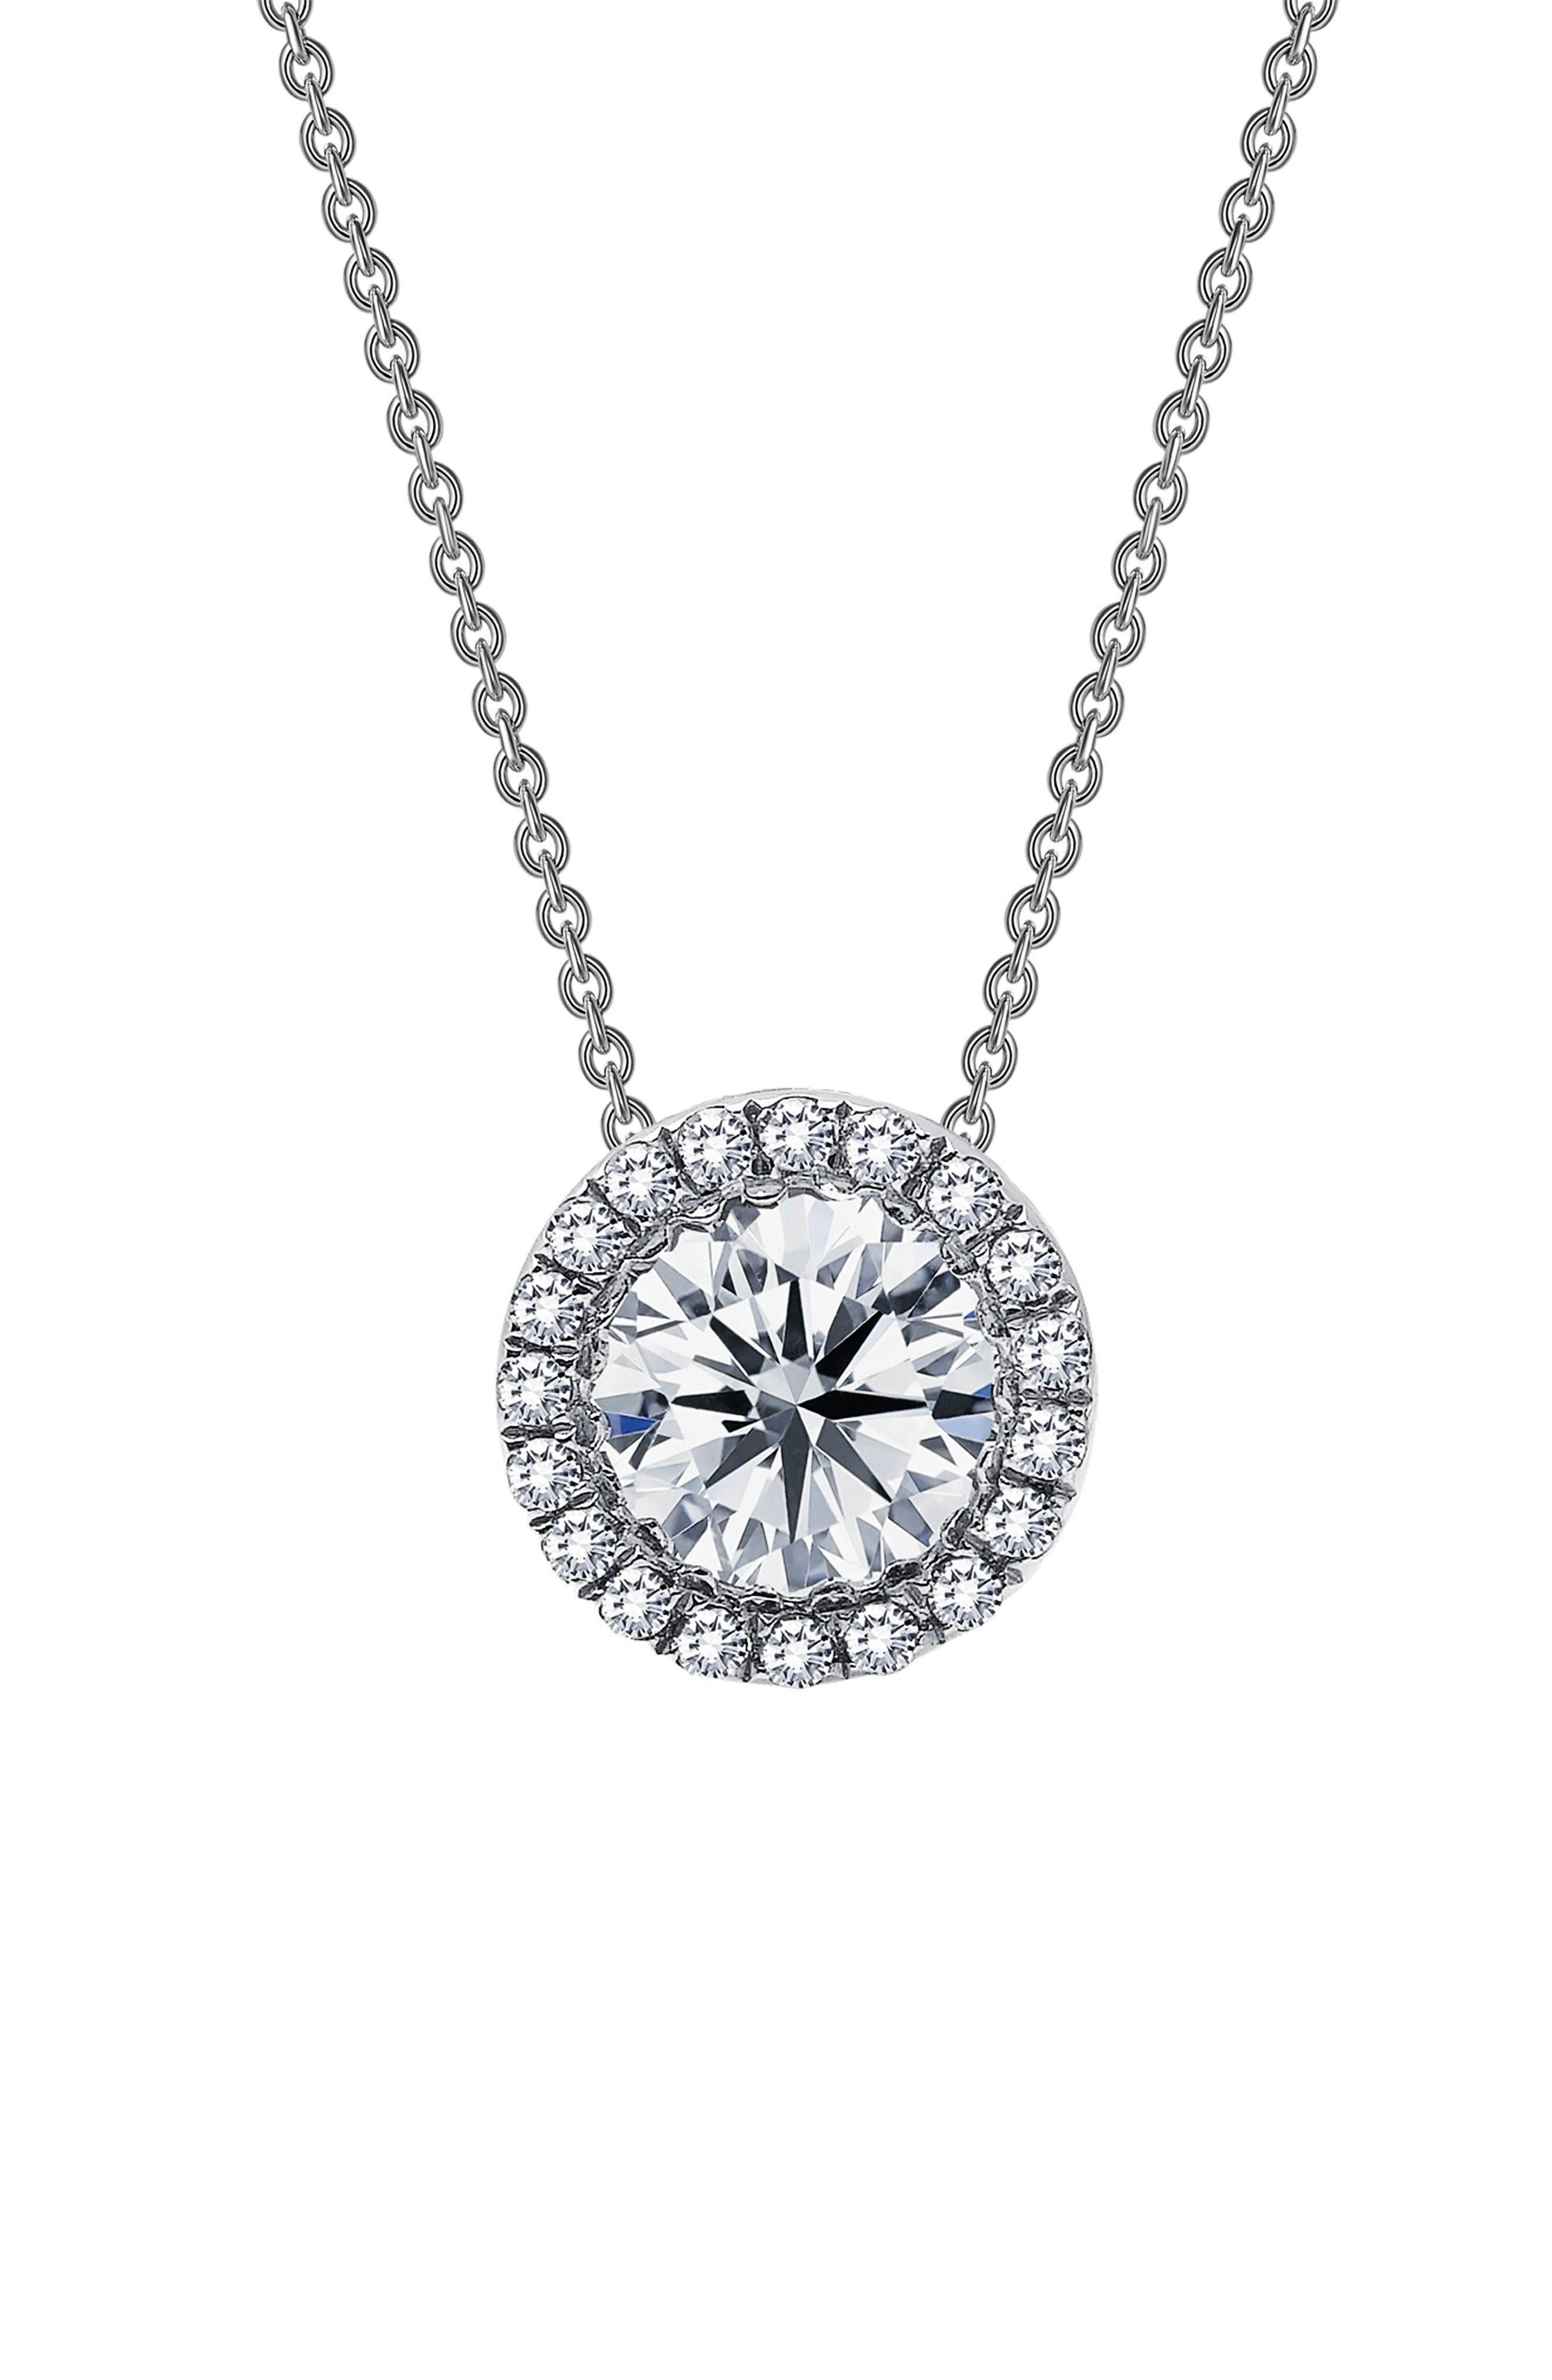 Simulated Diamond Pendant Necklace,                             Main thumbnail 1, color,                             Silver